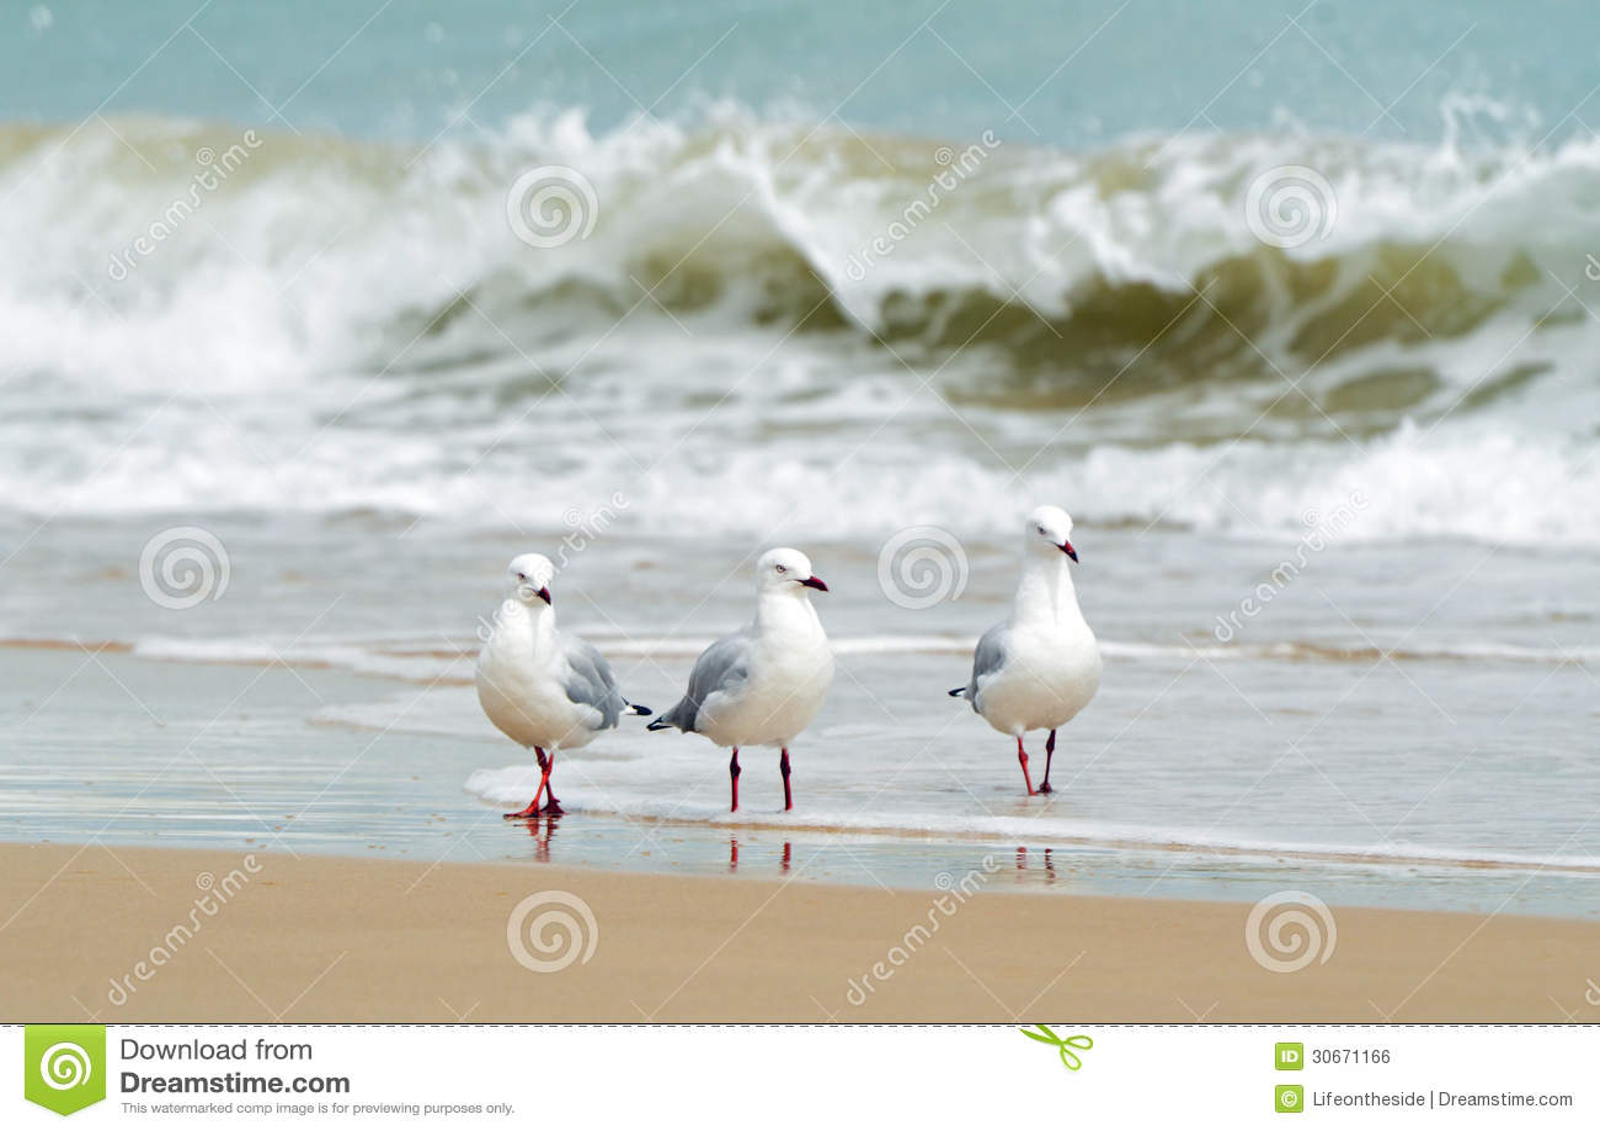 Three sea birds paddling in waters edge of beach